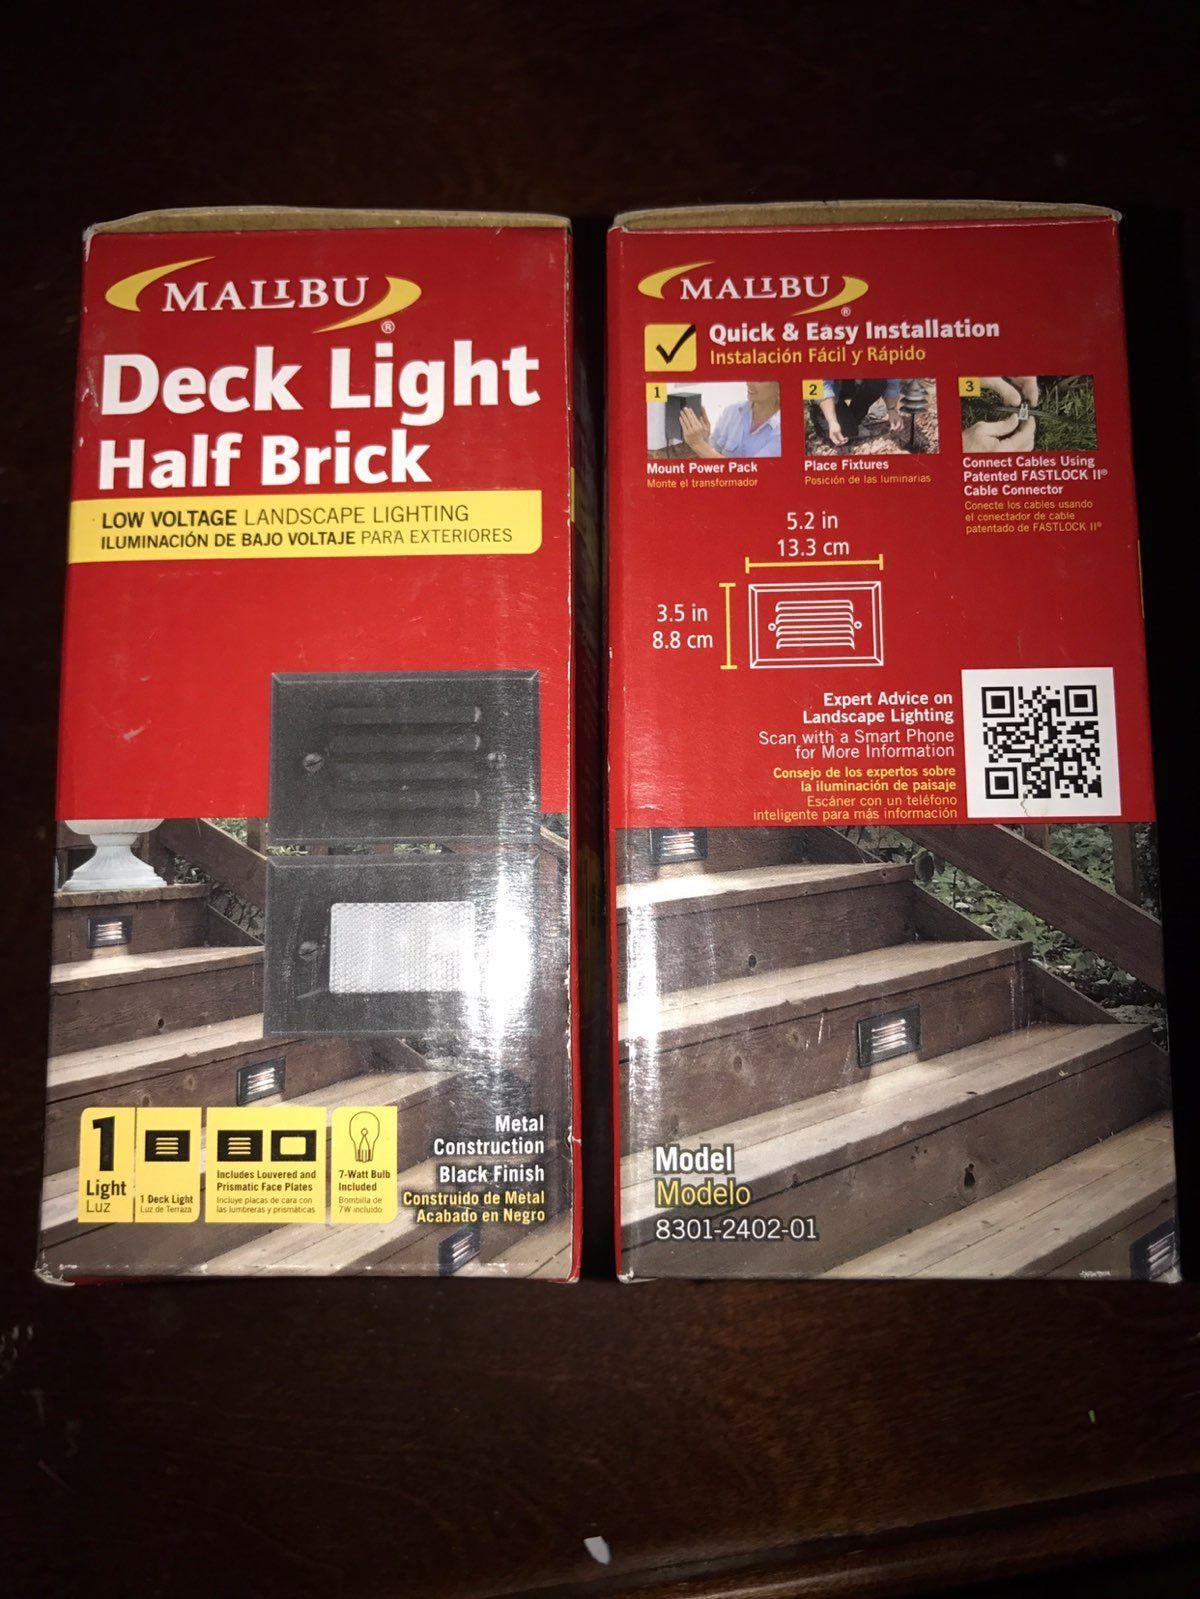 New malibu deck lights model 8301240201 mercari buy sell new malibu deck lights model 8301240201 aloadofball Image collections